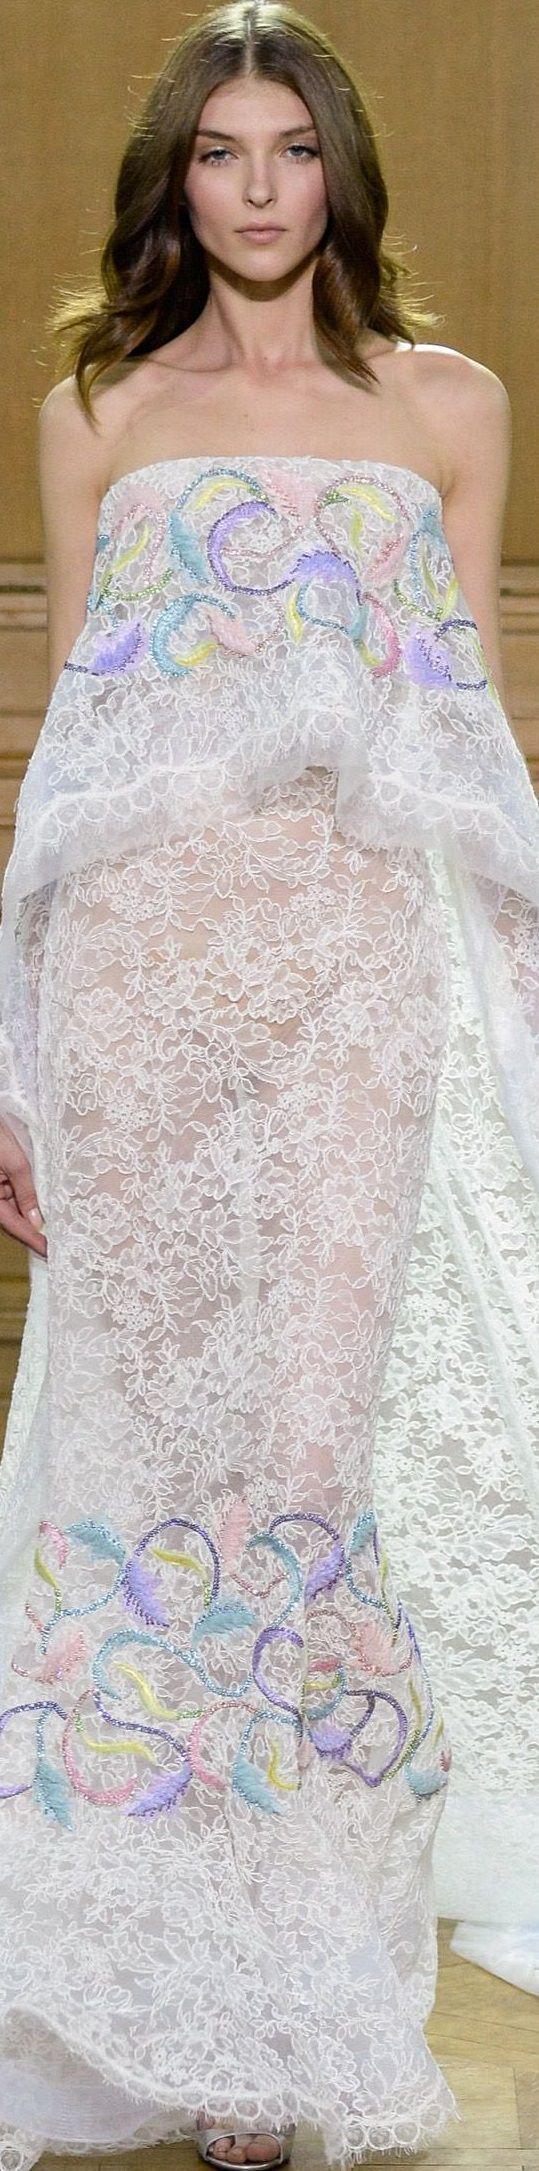 goodliness prom dresses,prom maxi dress 2017 #uniors #dresses 2018log-style-news.com